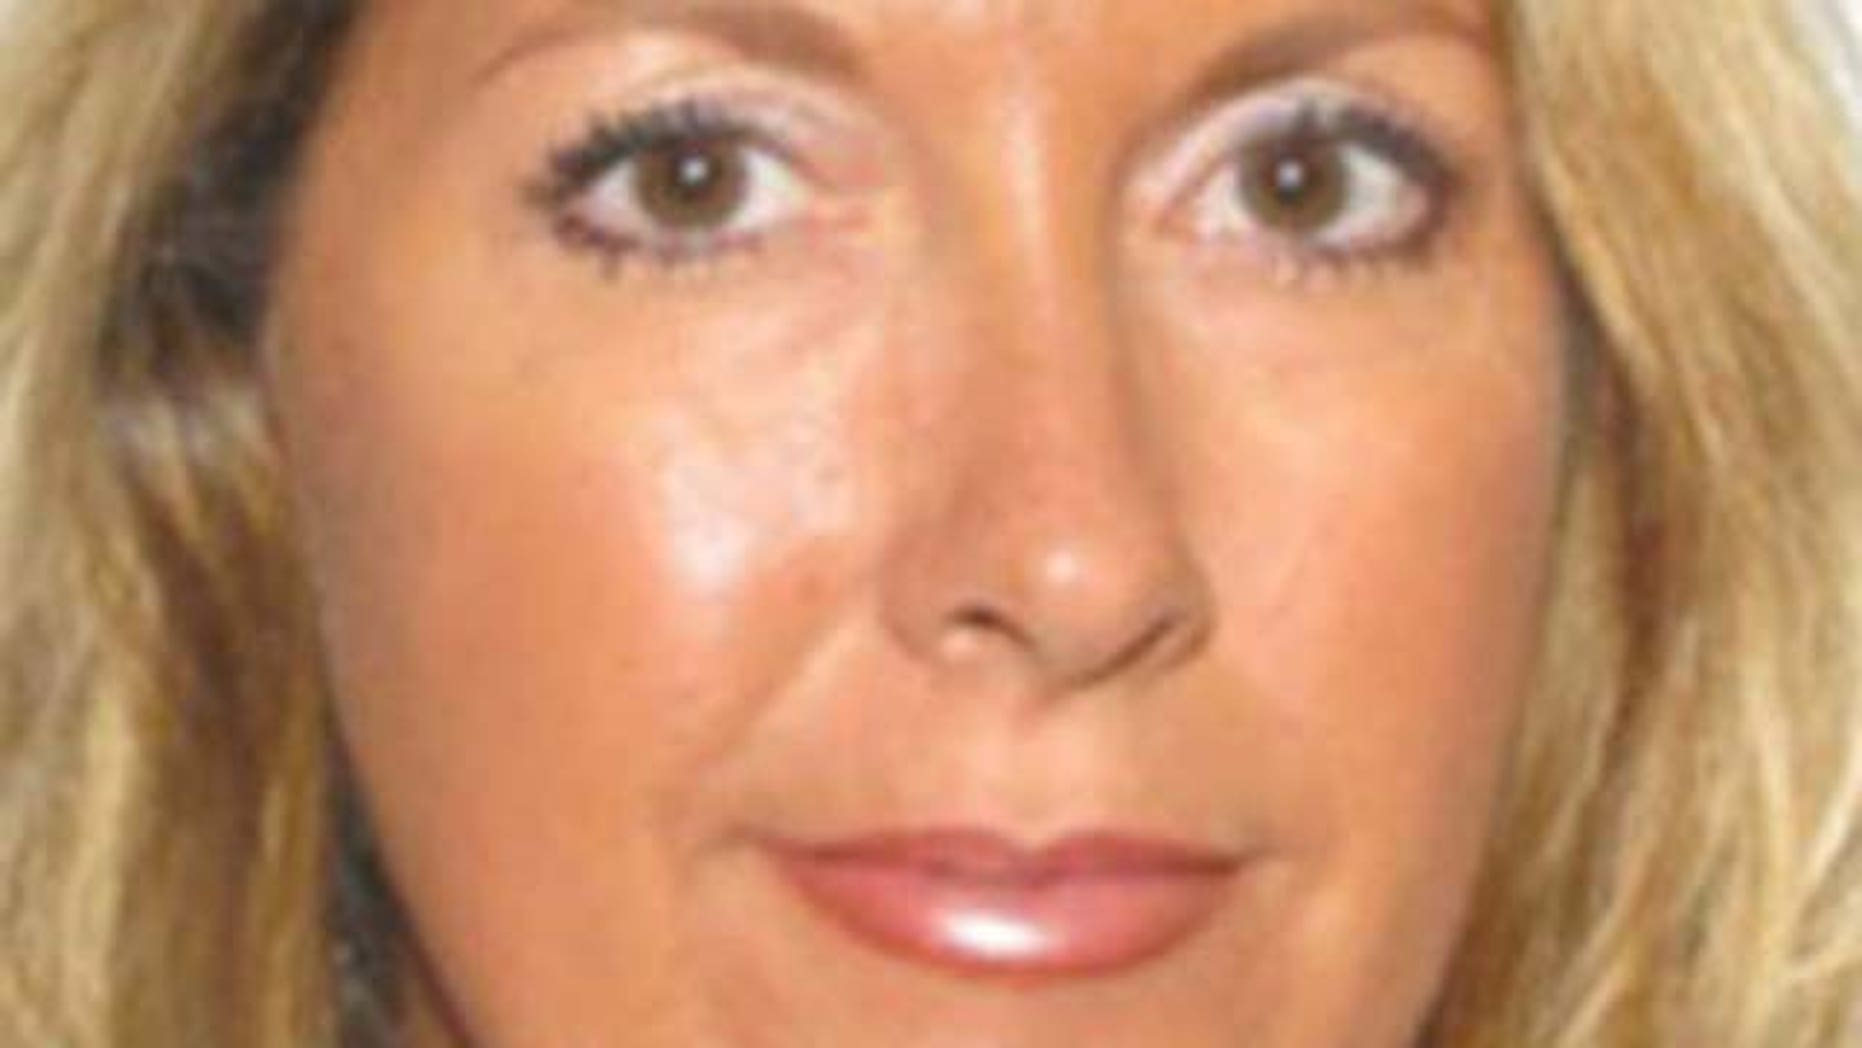 This police handout photo shows Angela Nolen.